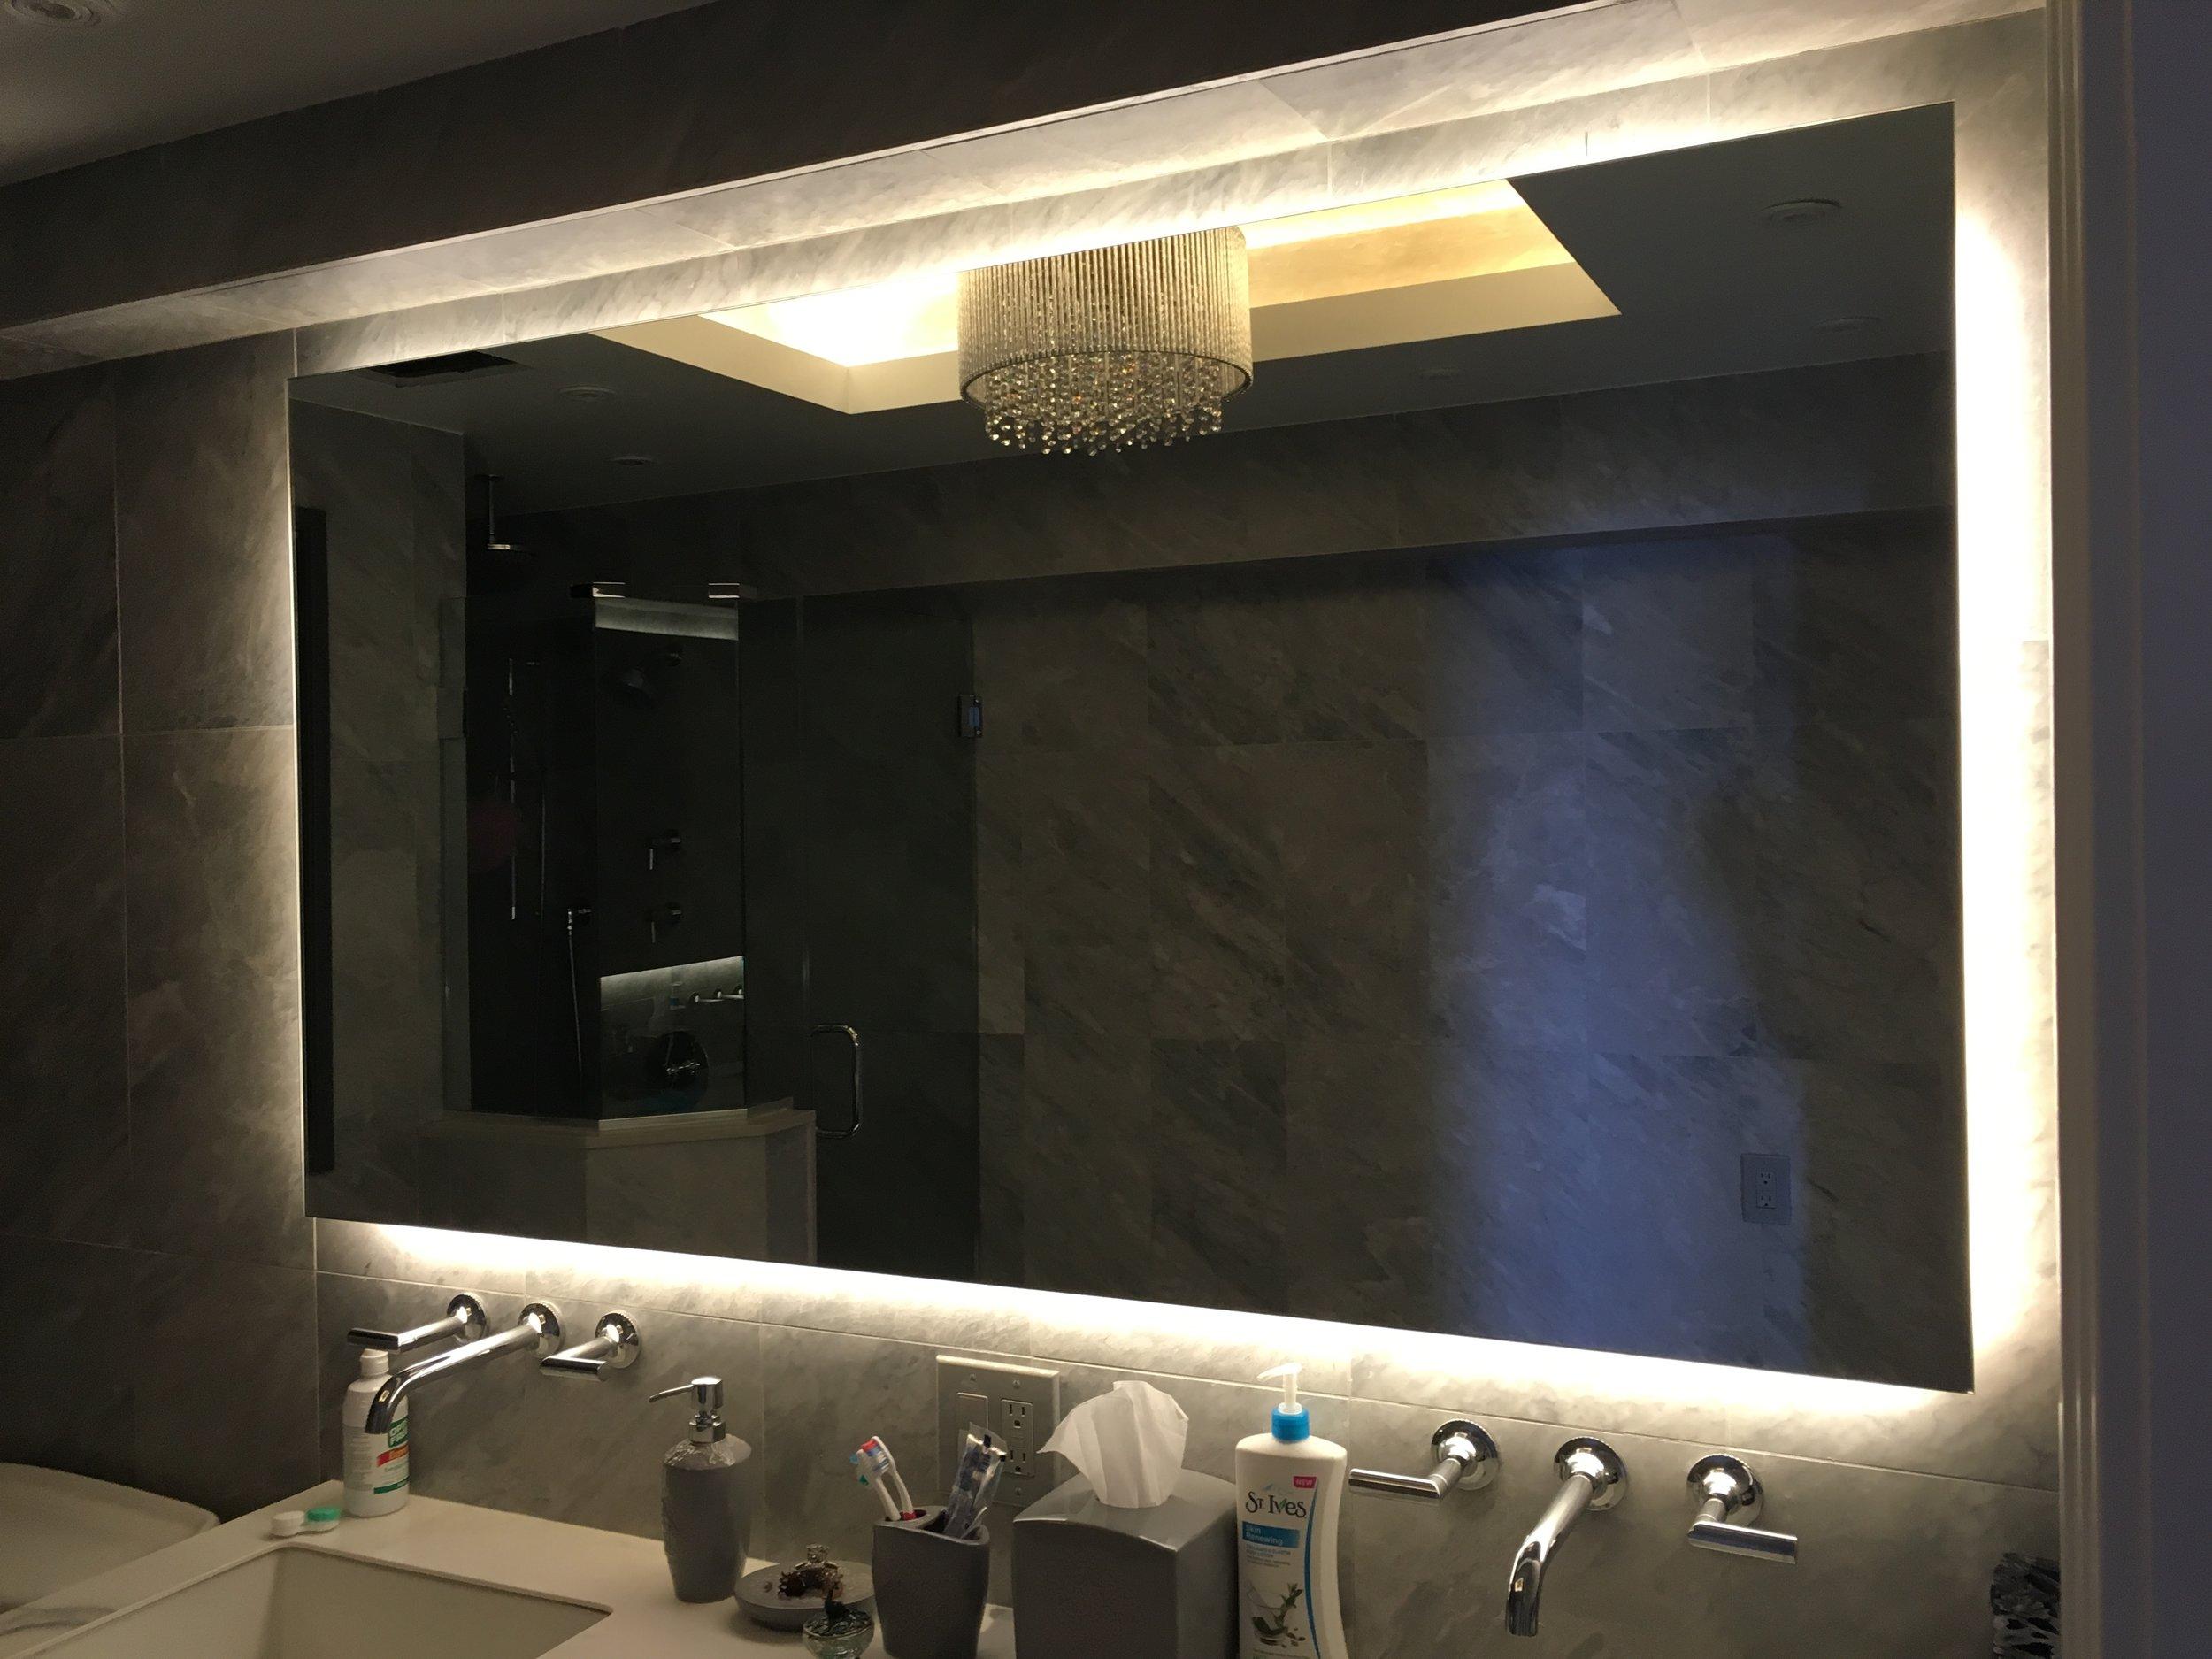 Behind-mirror LED tape light